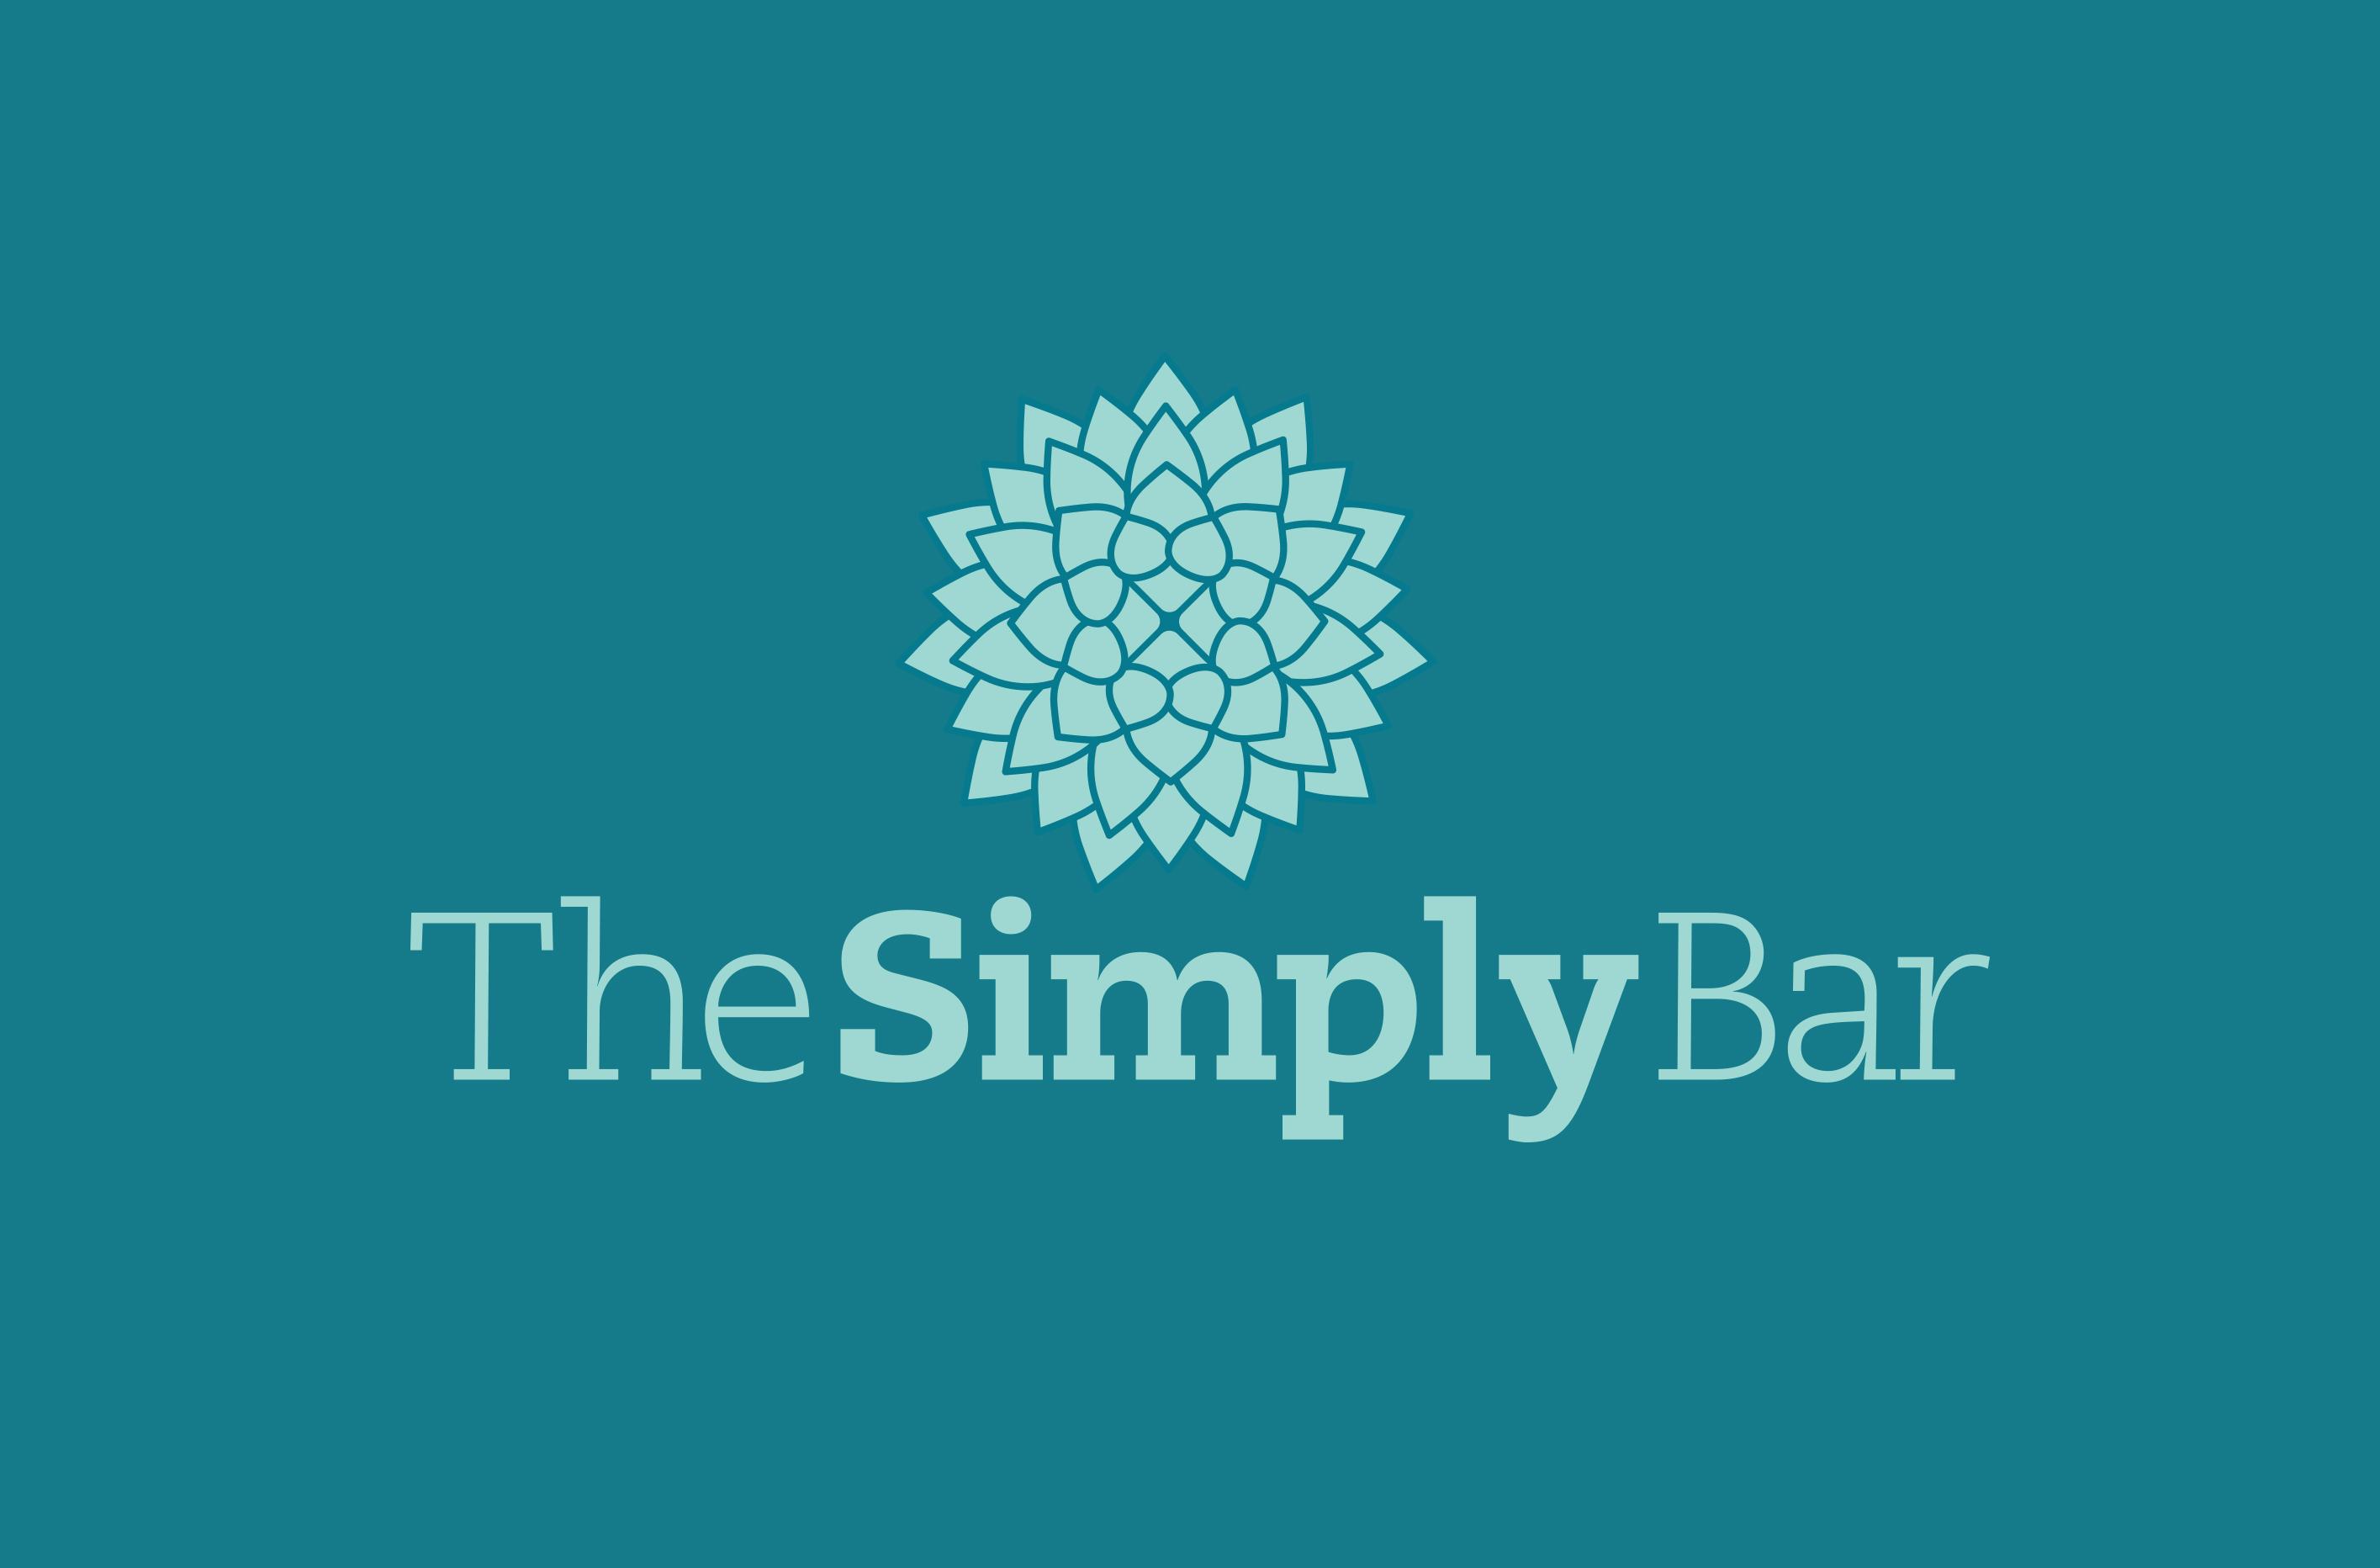 Simply Bar logo